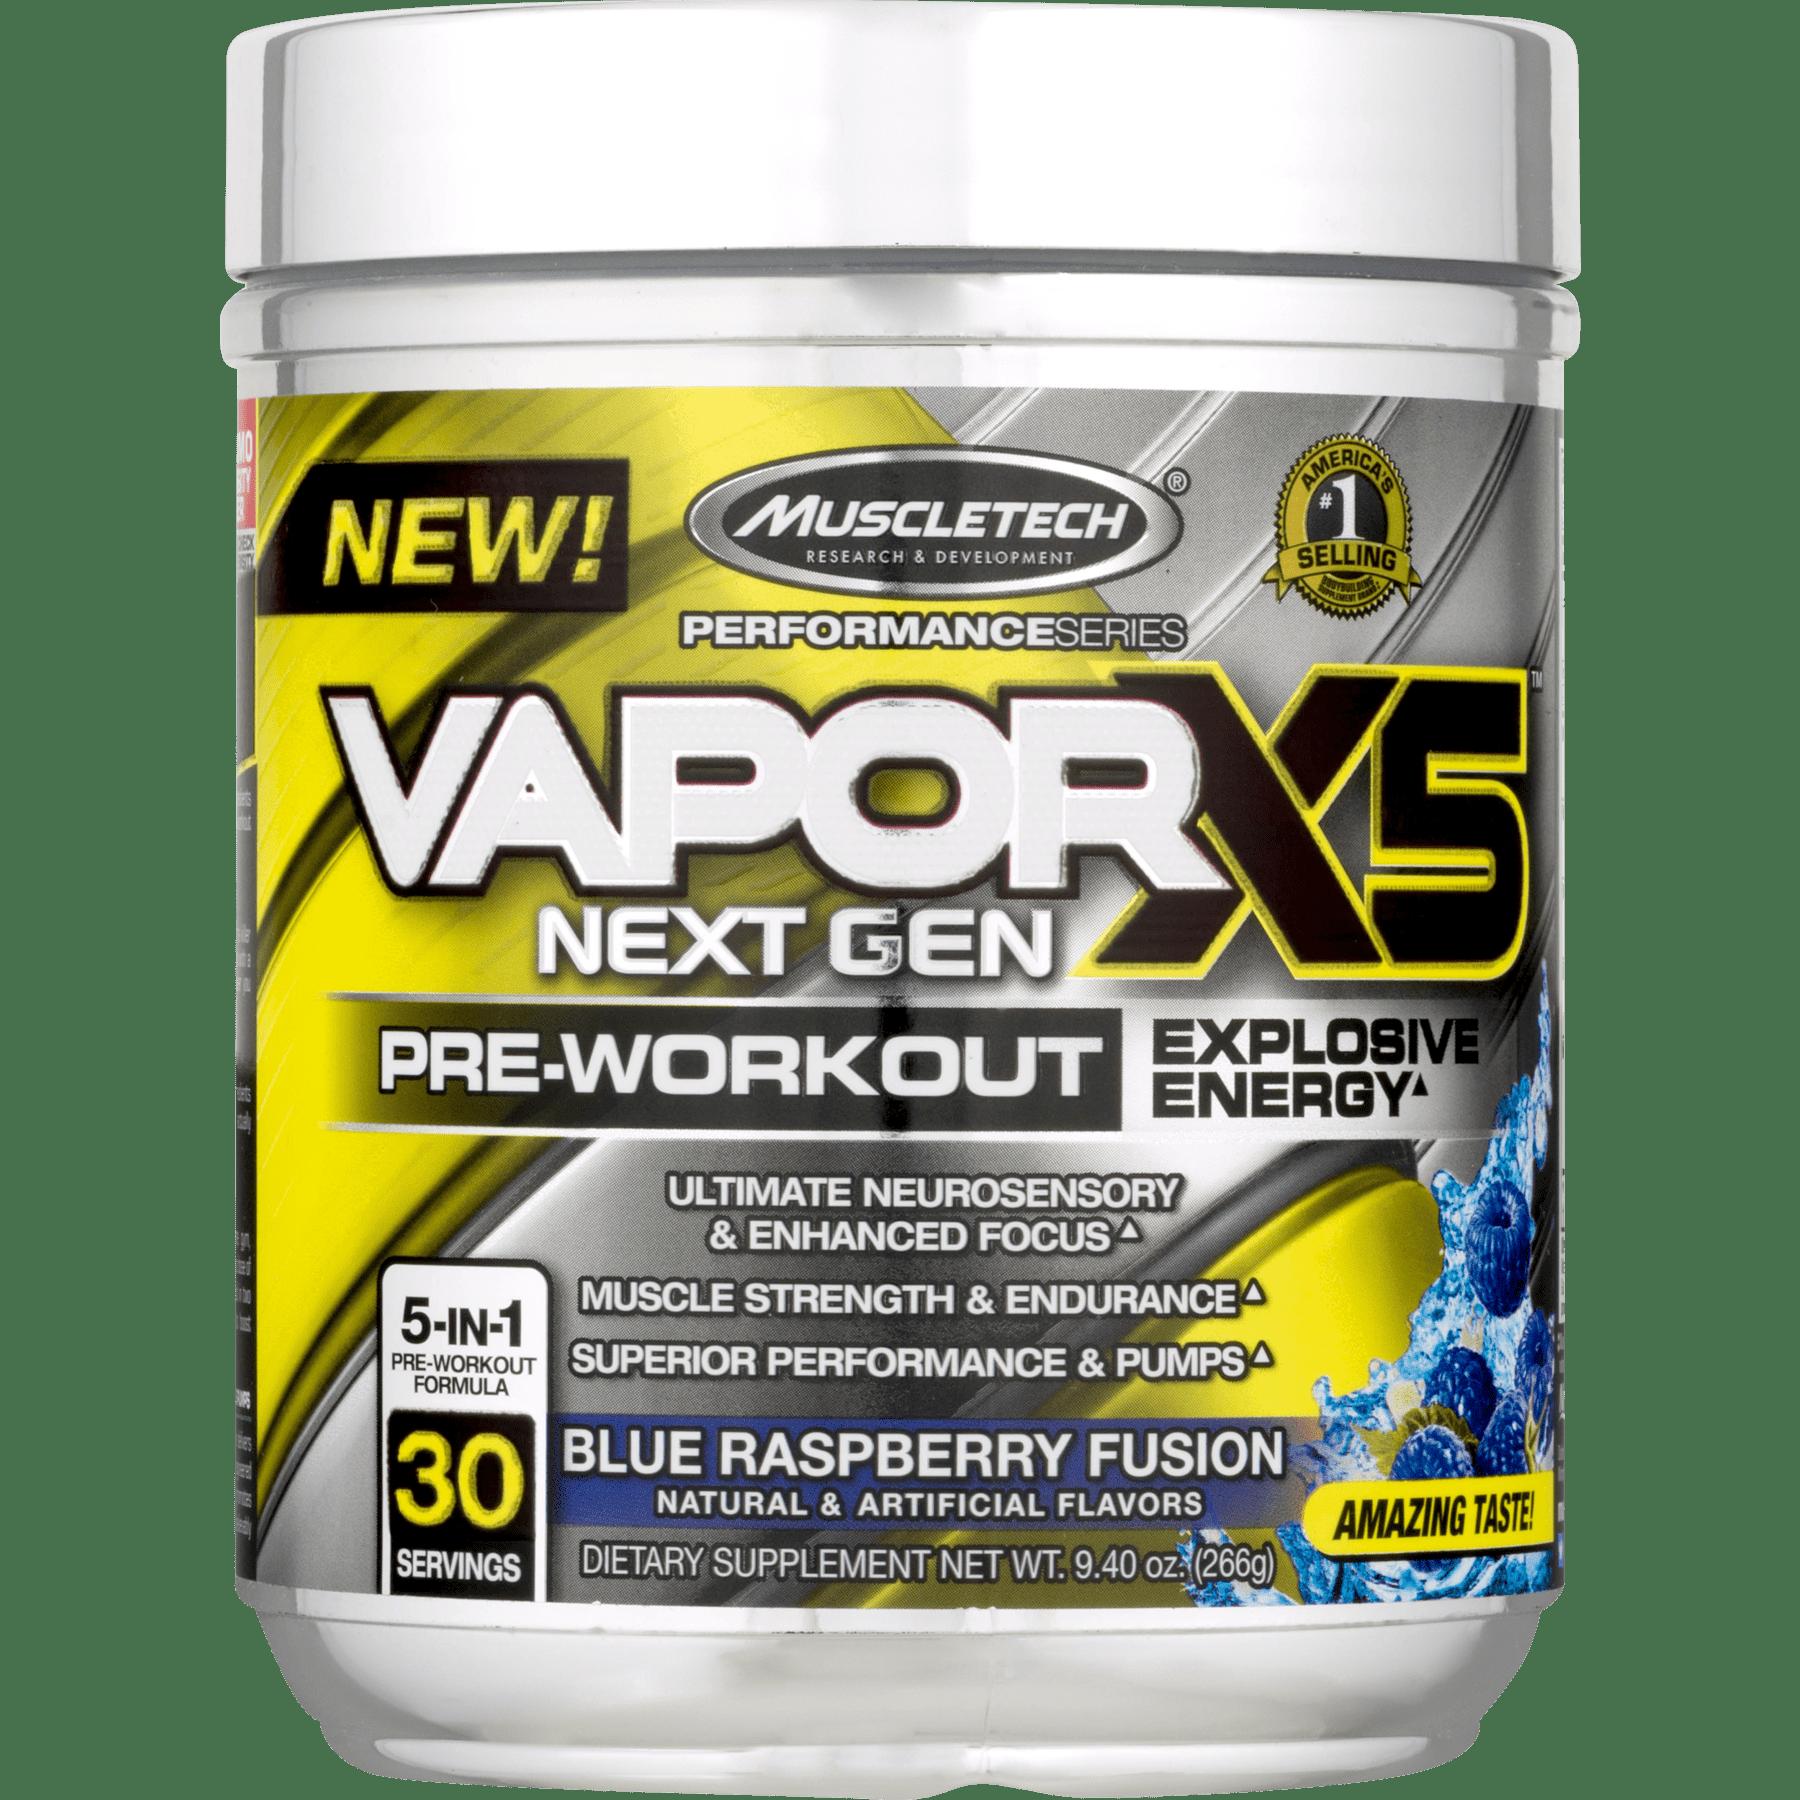 MuscleTech Vapor X5 Next Gen Explosive Energy Pre Workout